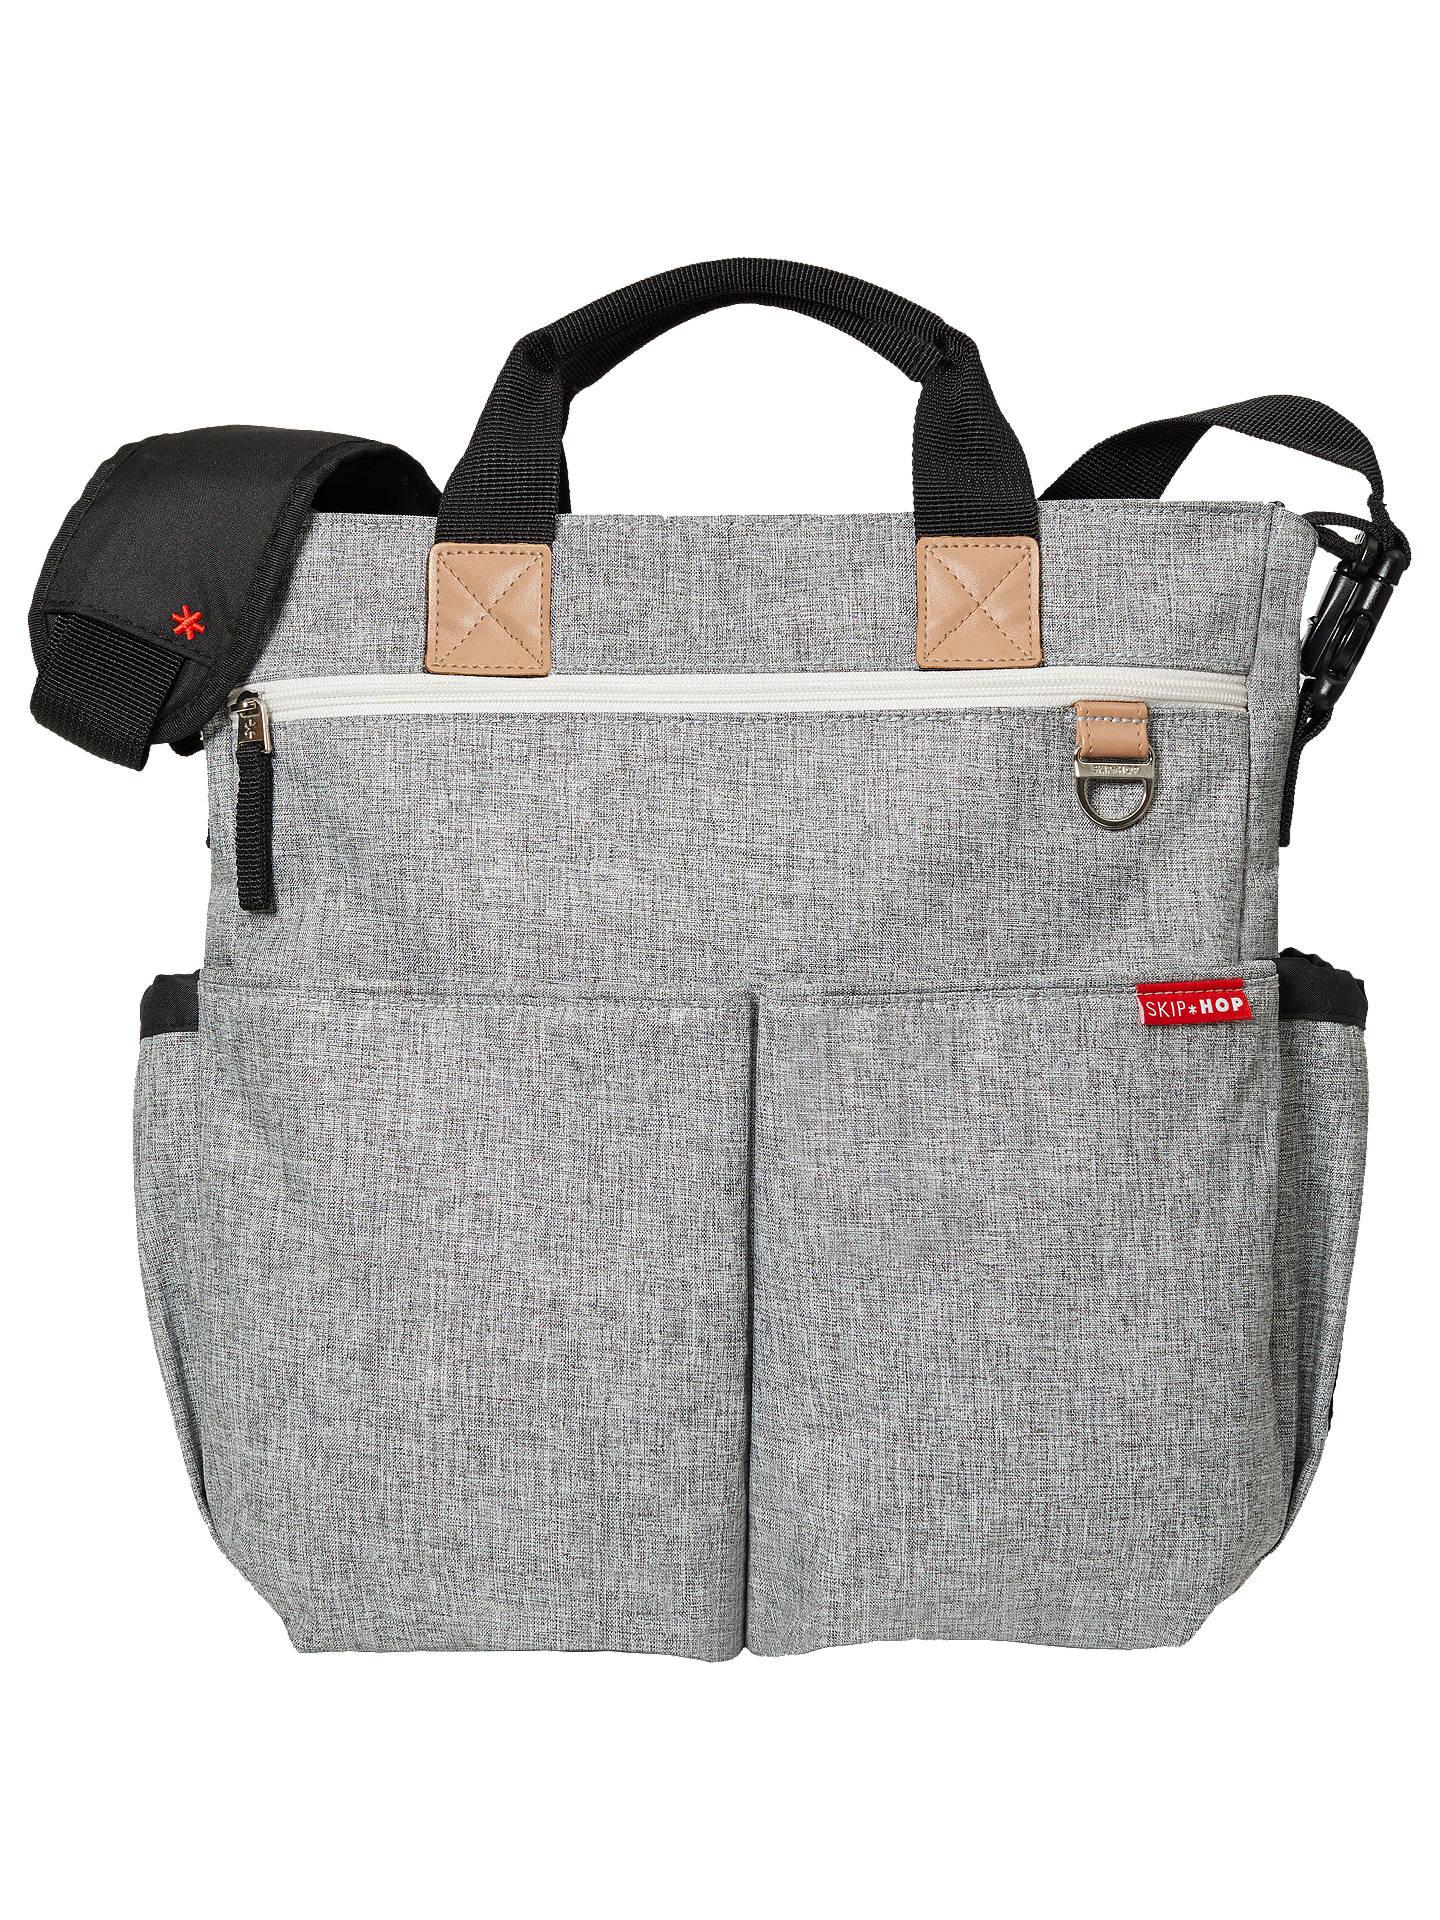 79babddffdc6 Buy Skip Hop Duo Signature Changing Bag, Mid Grey Online at johnlewis.com  ...